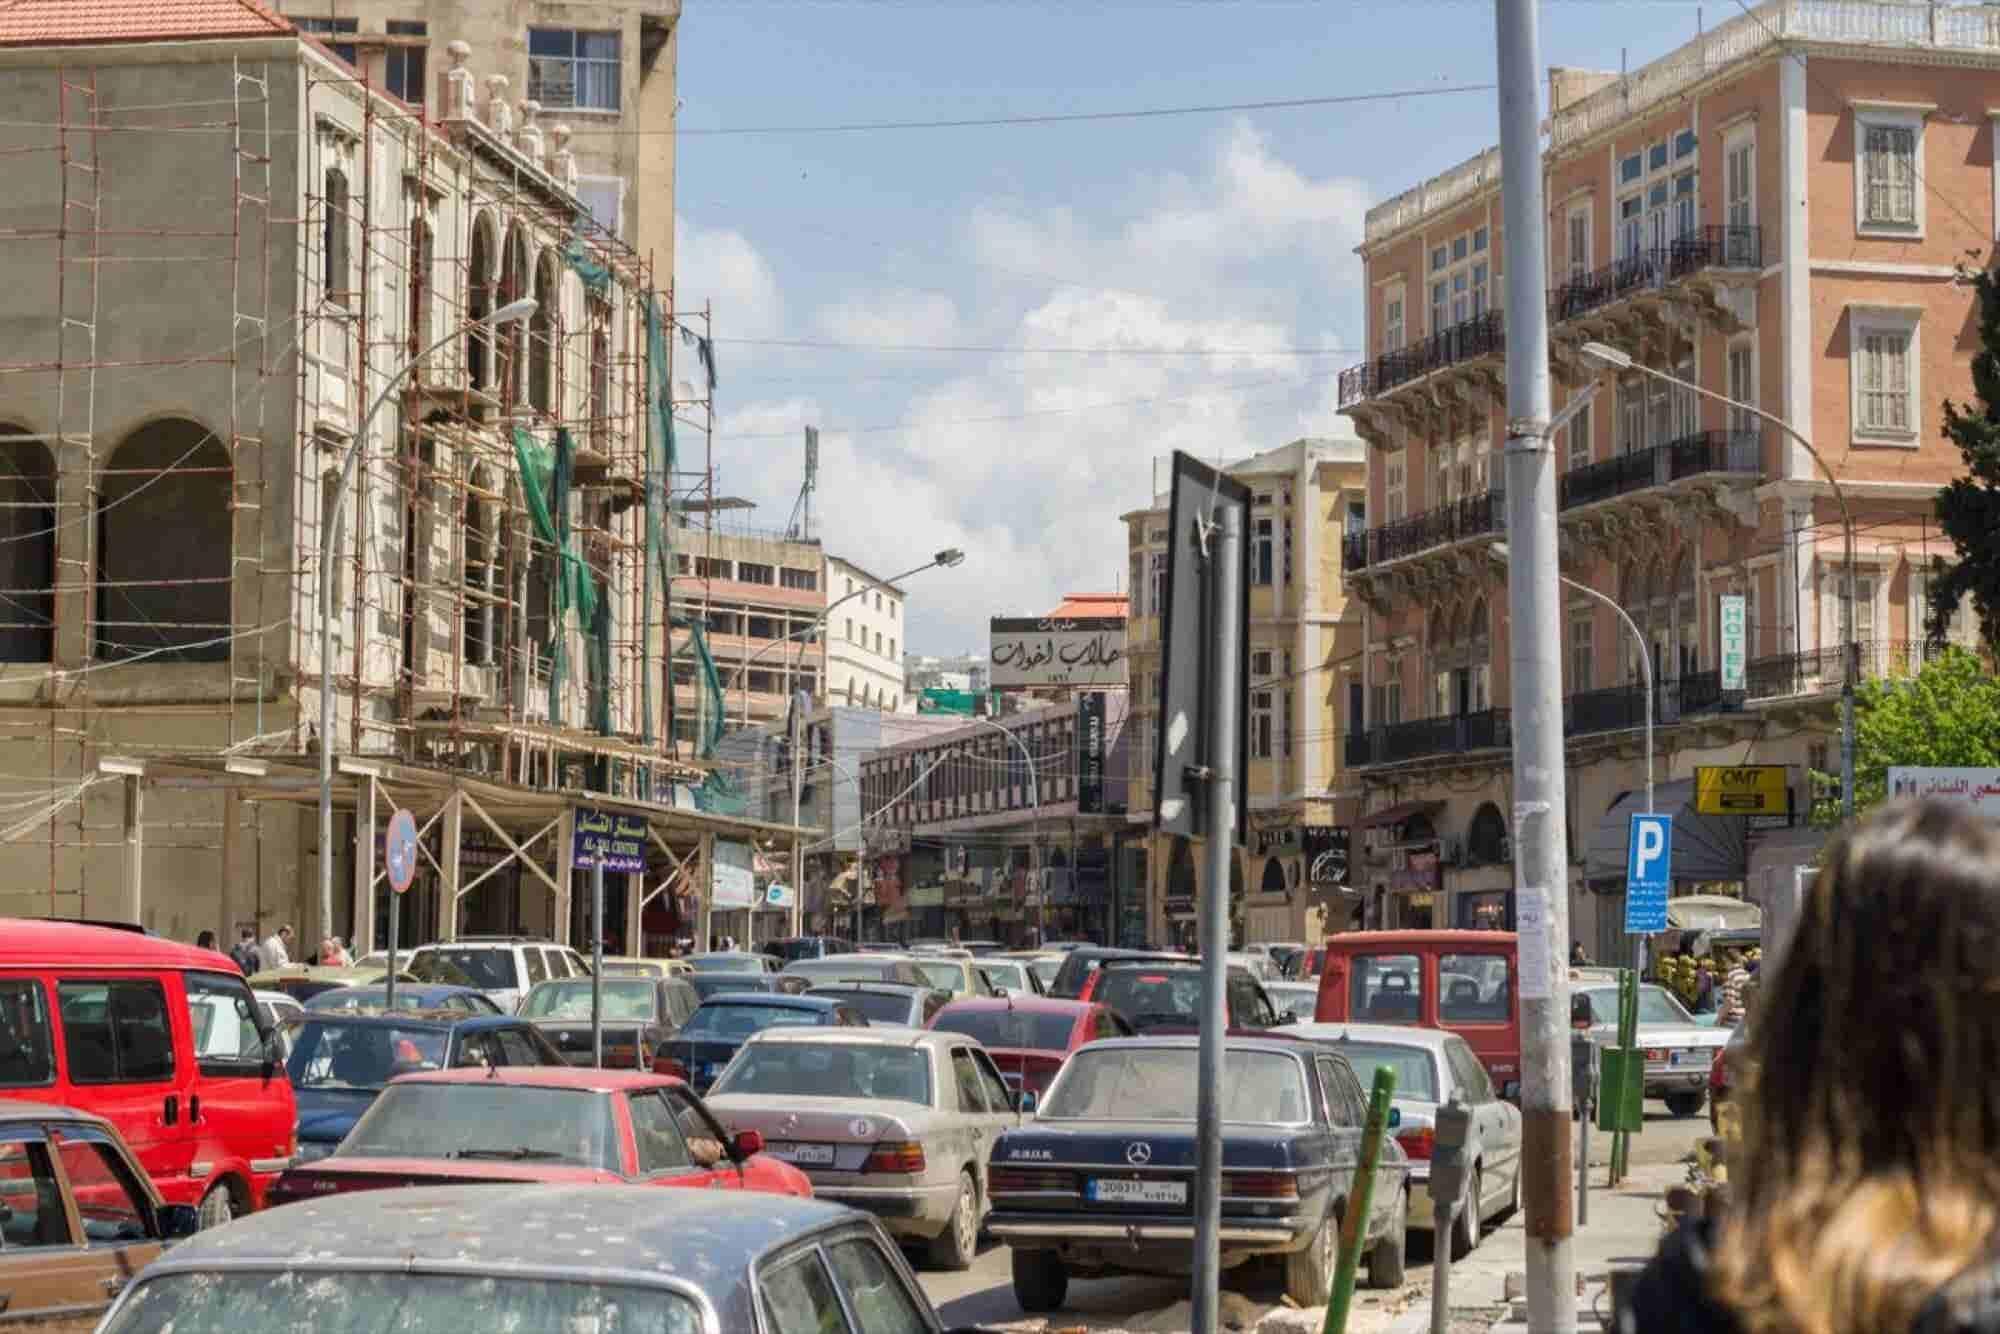 Meet LiBeiroot, The Car-Hailing App Straddling The Lebanese-Syrian Border